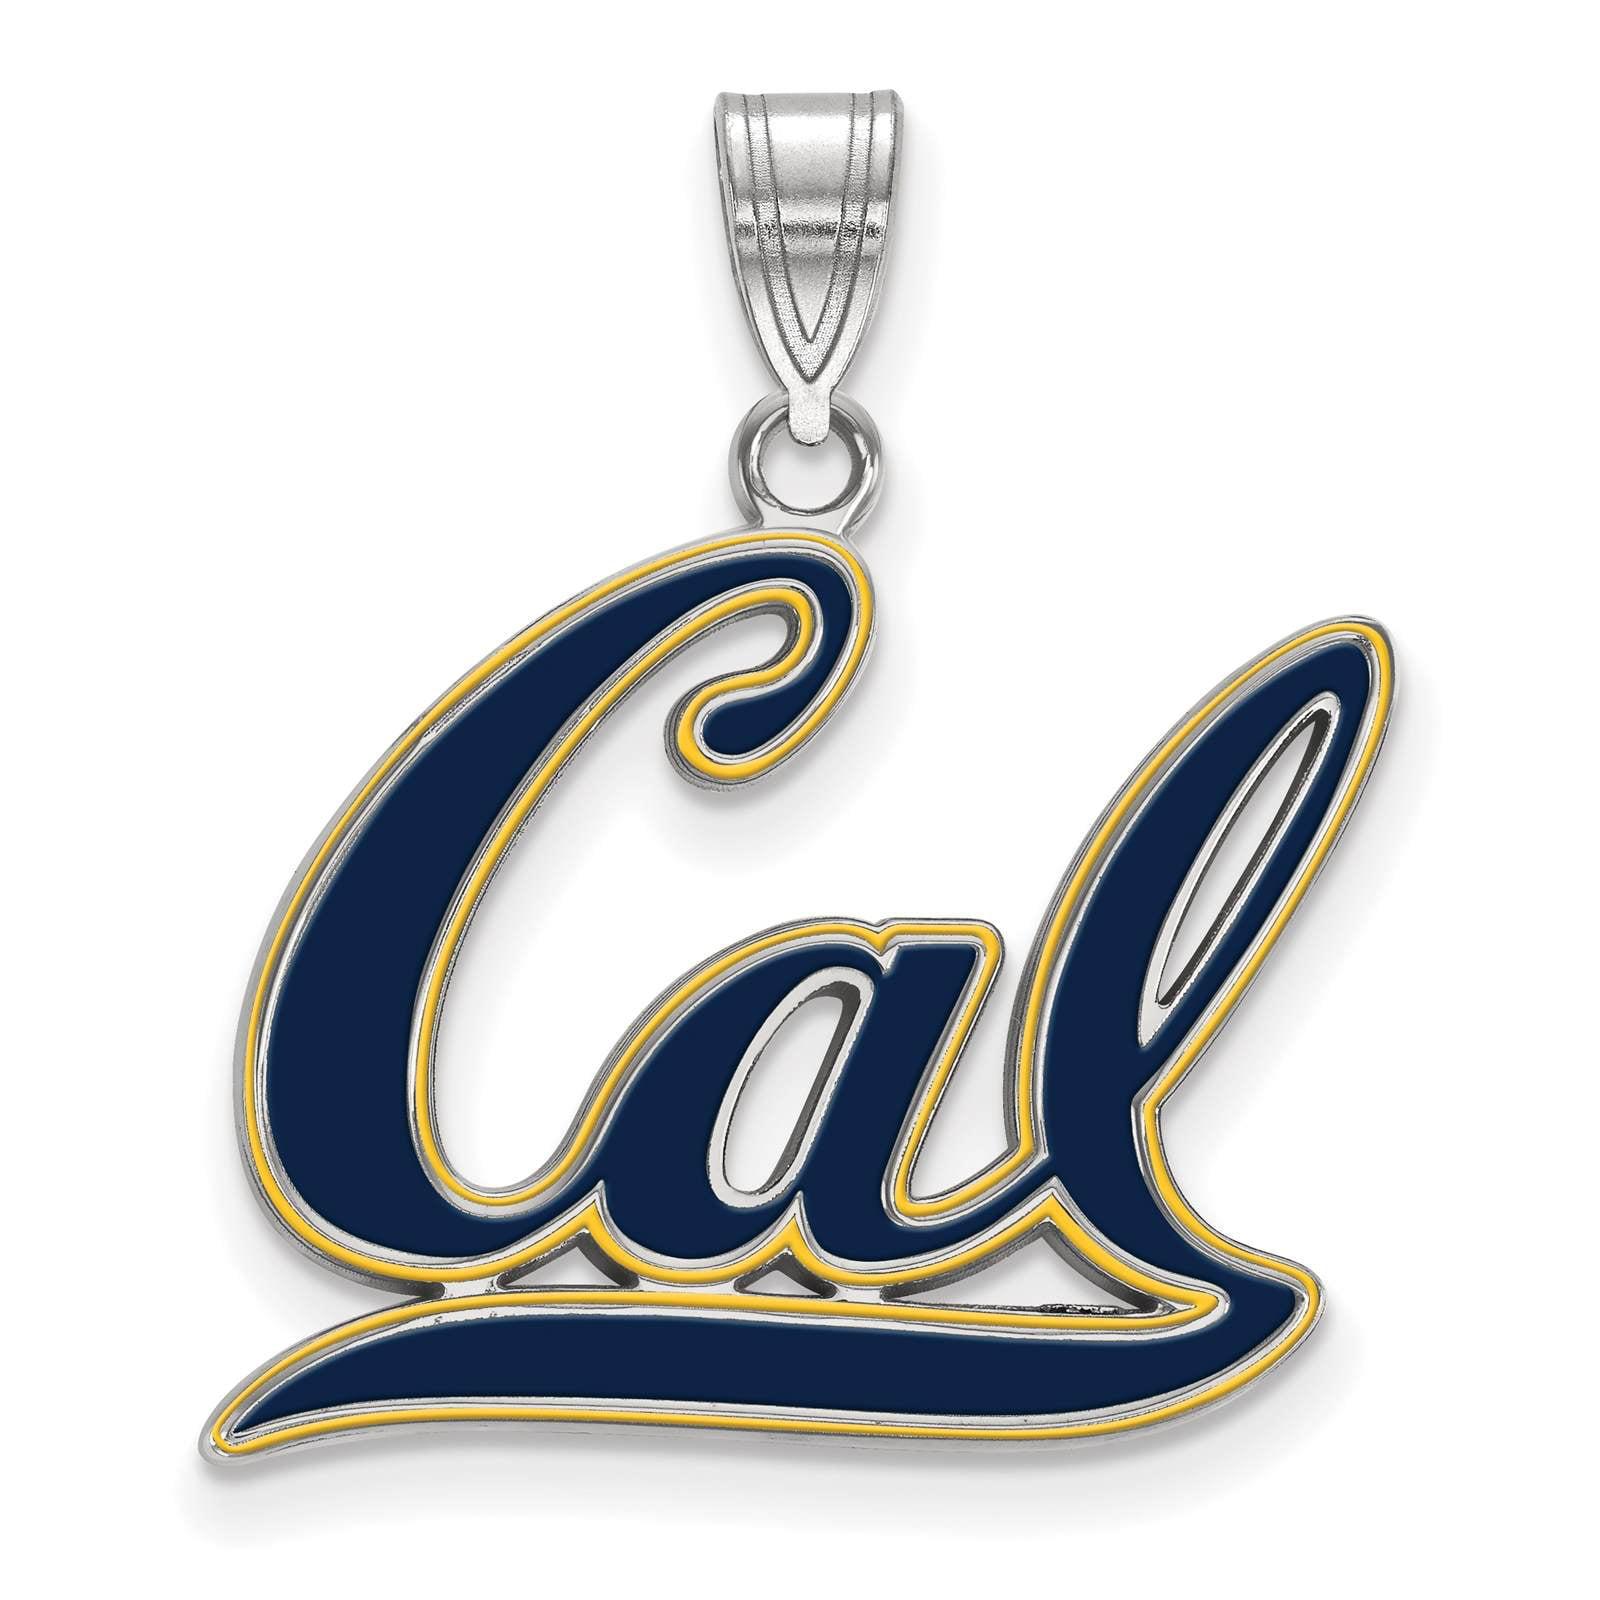 925 Sterling Silver Rhodium-plated Laser-cut University of California Berkeley Football Pendant